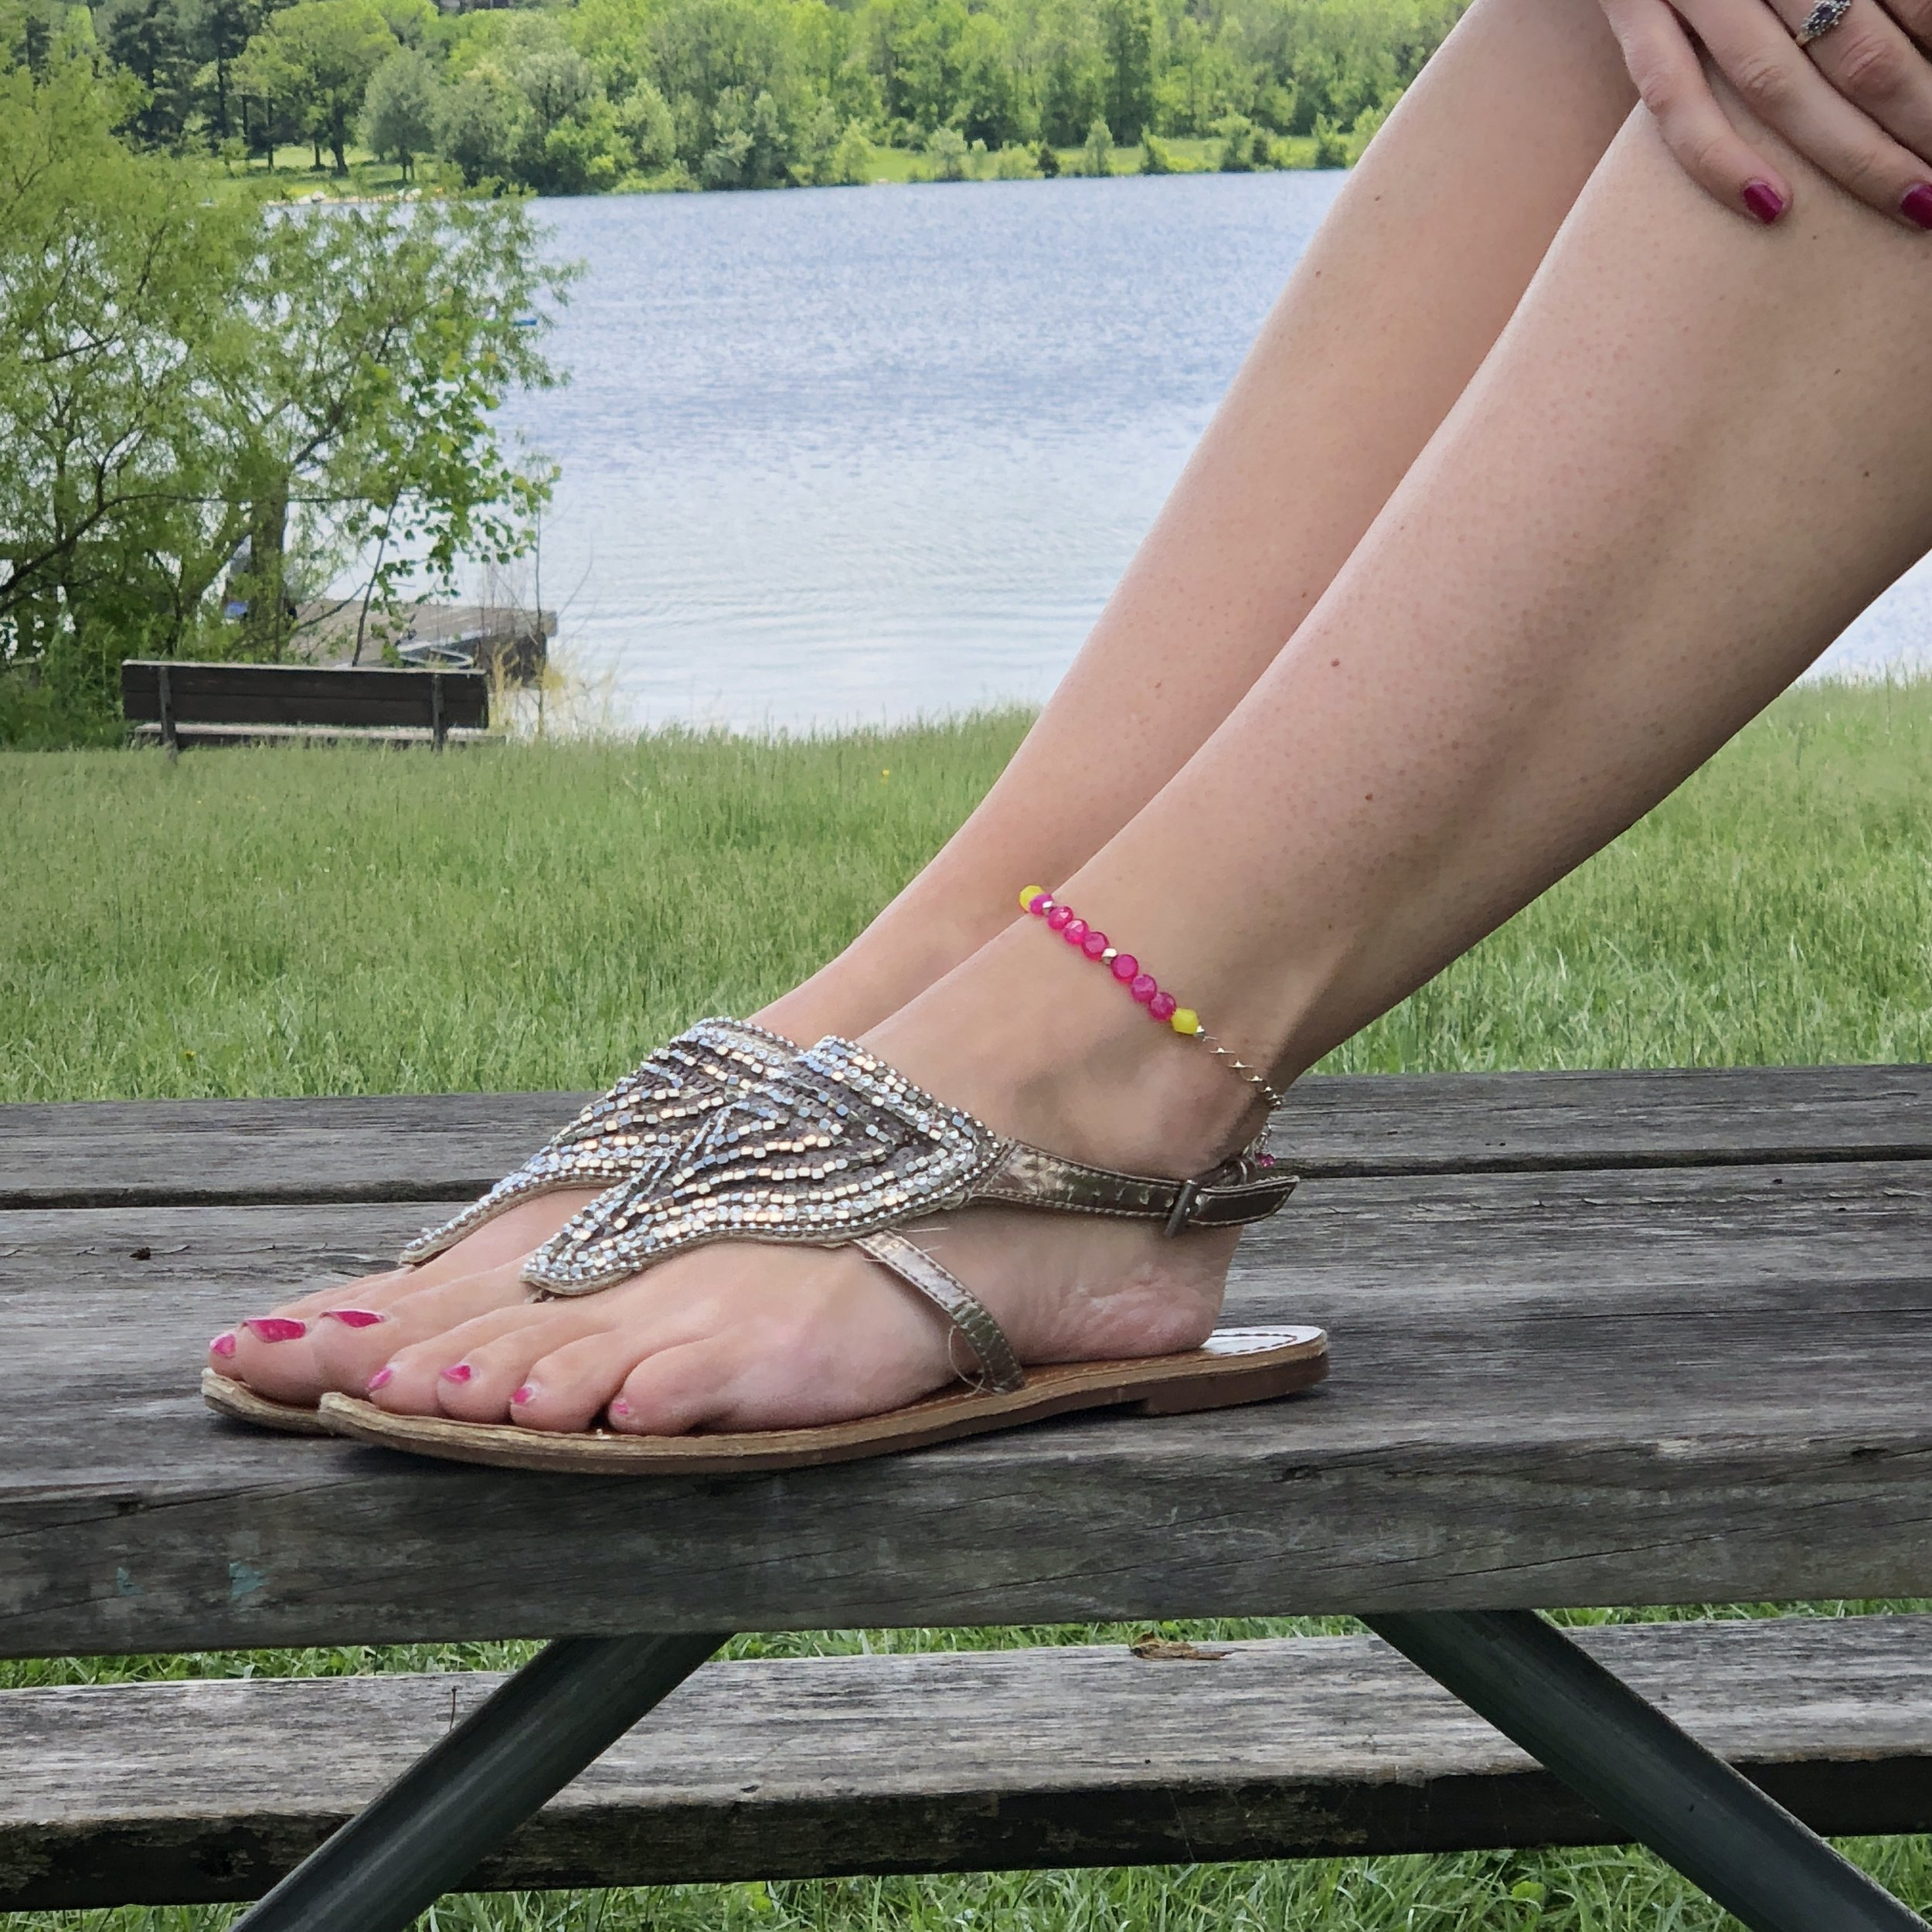 morse-code-anklet.JPG